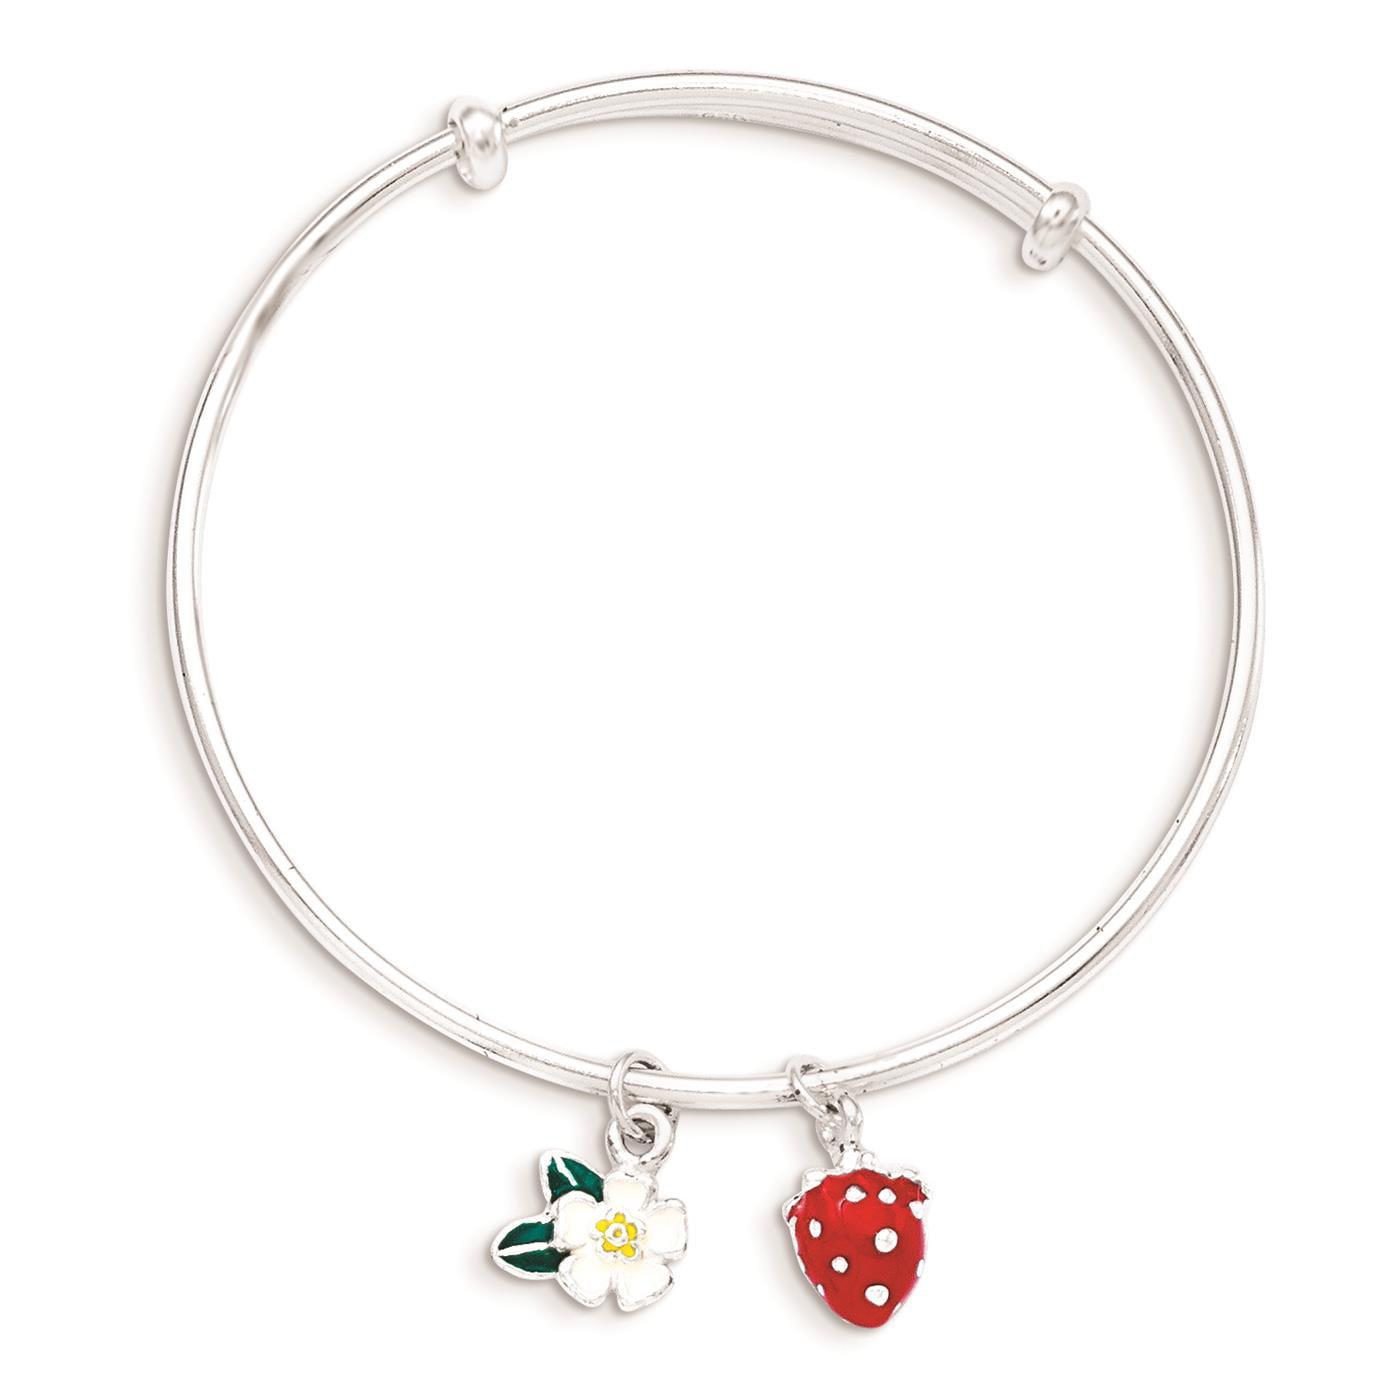 Childrens 925 Sterling Silver Enamel Kid's Flower and Strawberry Dangle Bangle